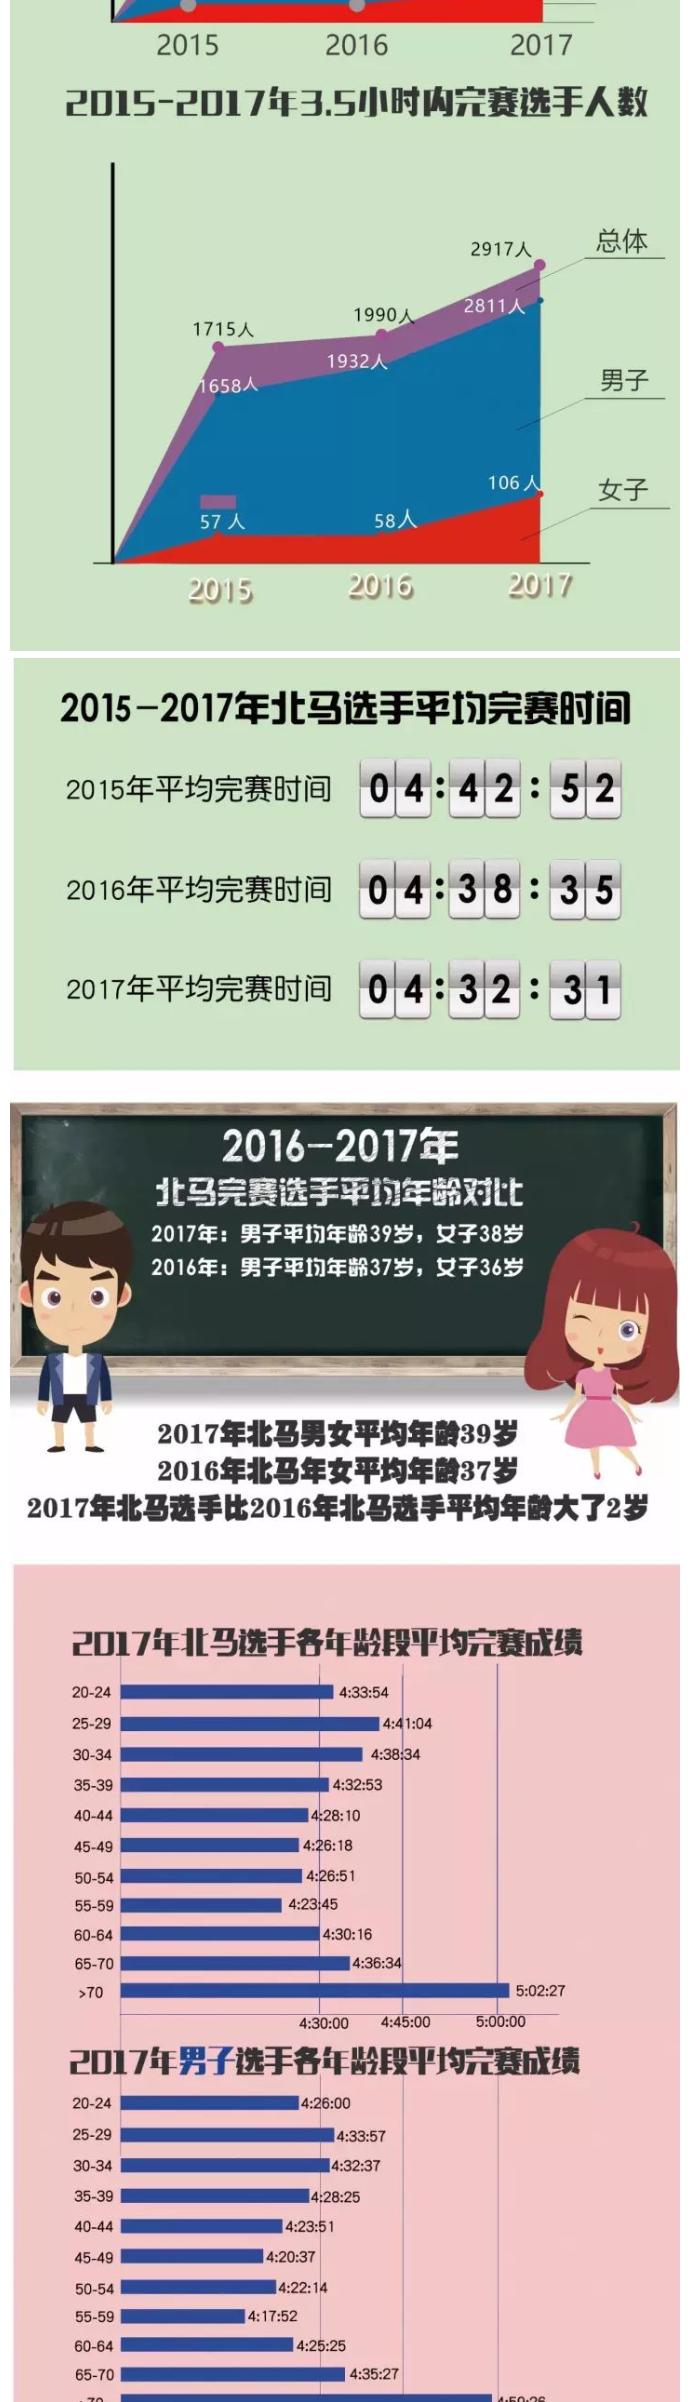 火狐截图_2017-10-13T08-57-26_05.png